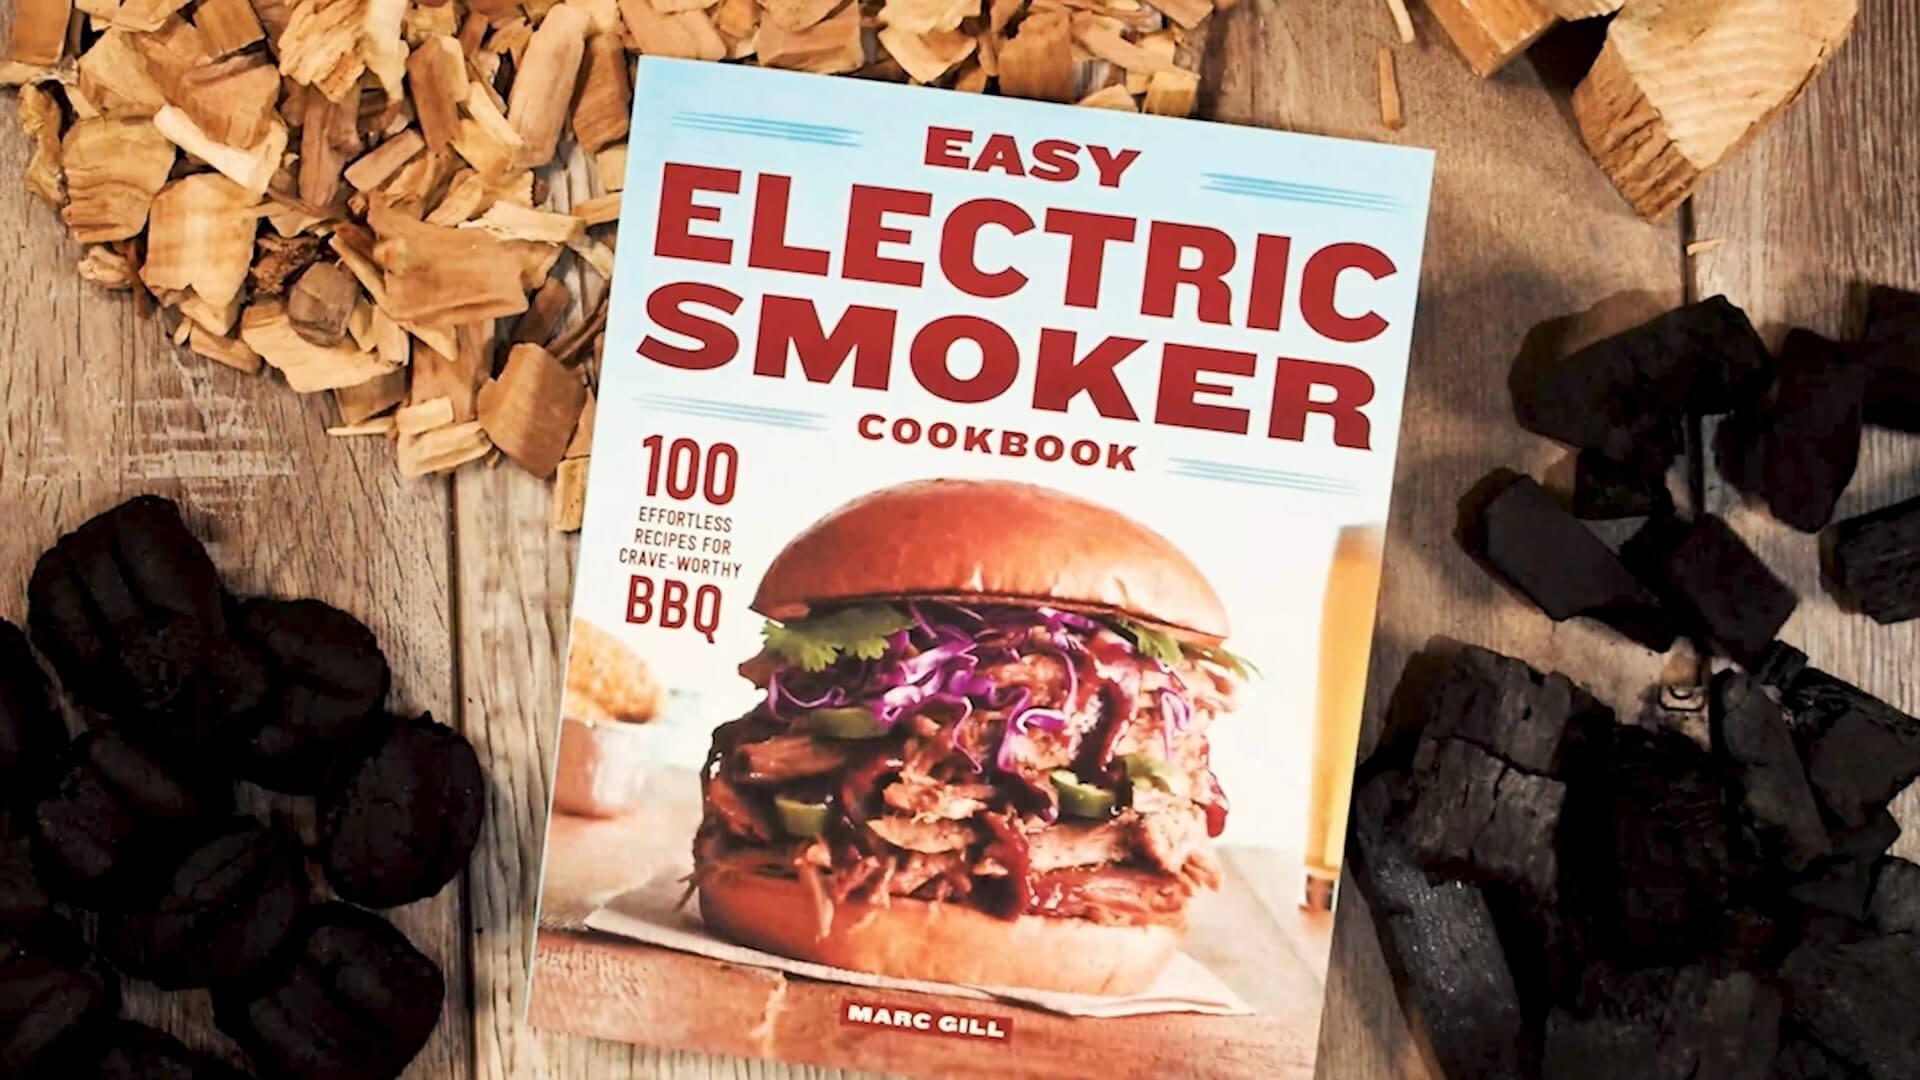 Easy Electric Smoker Cookbook